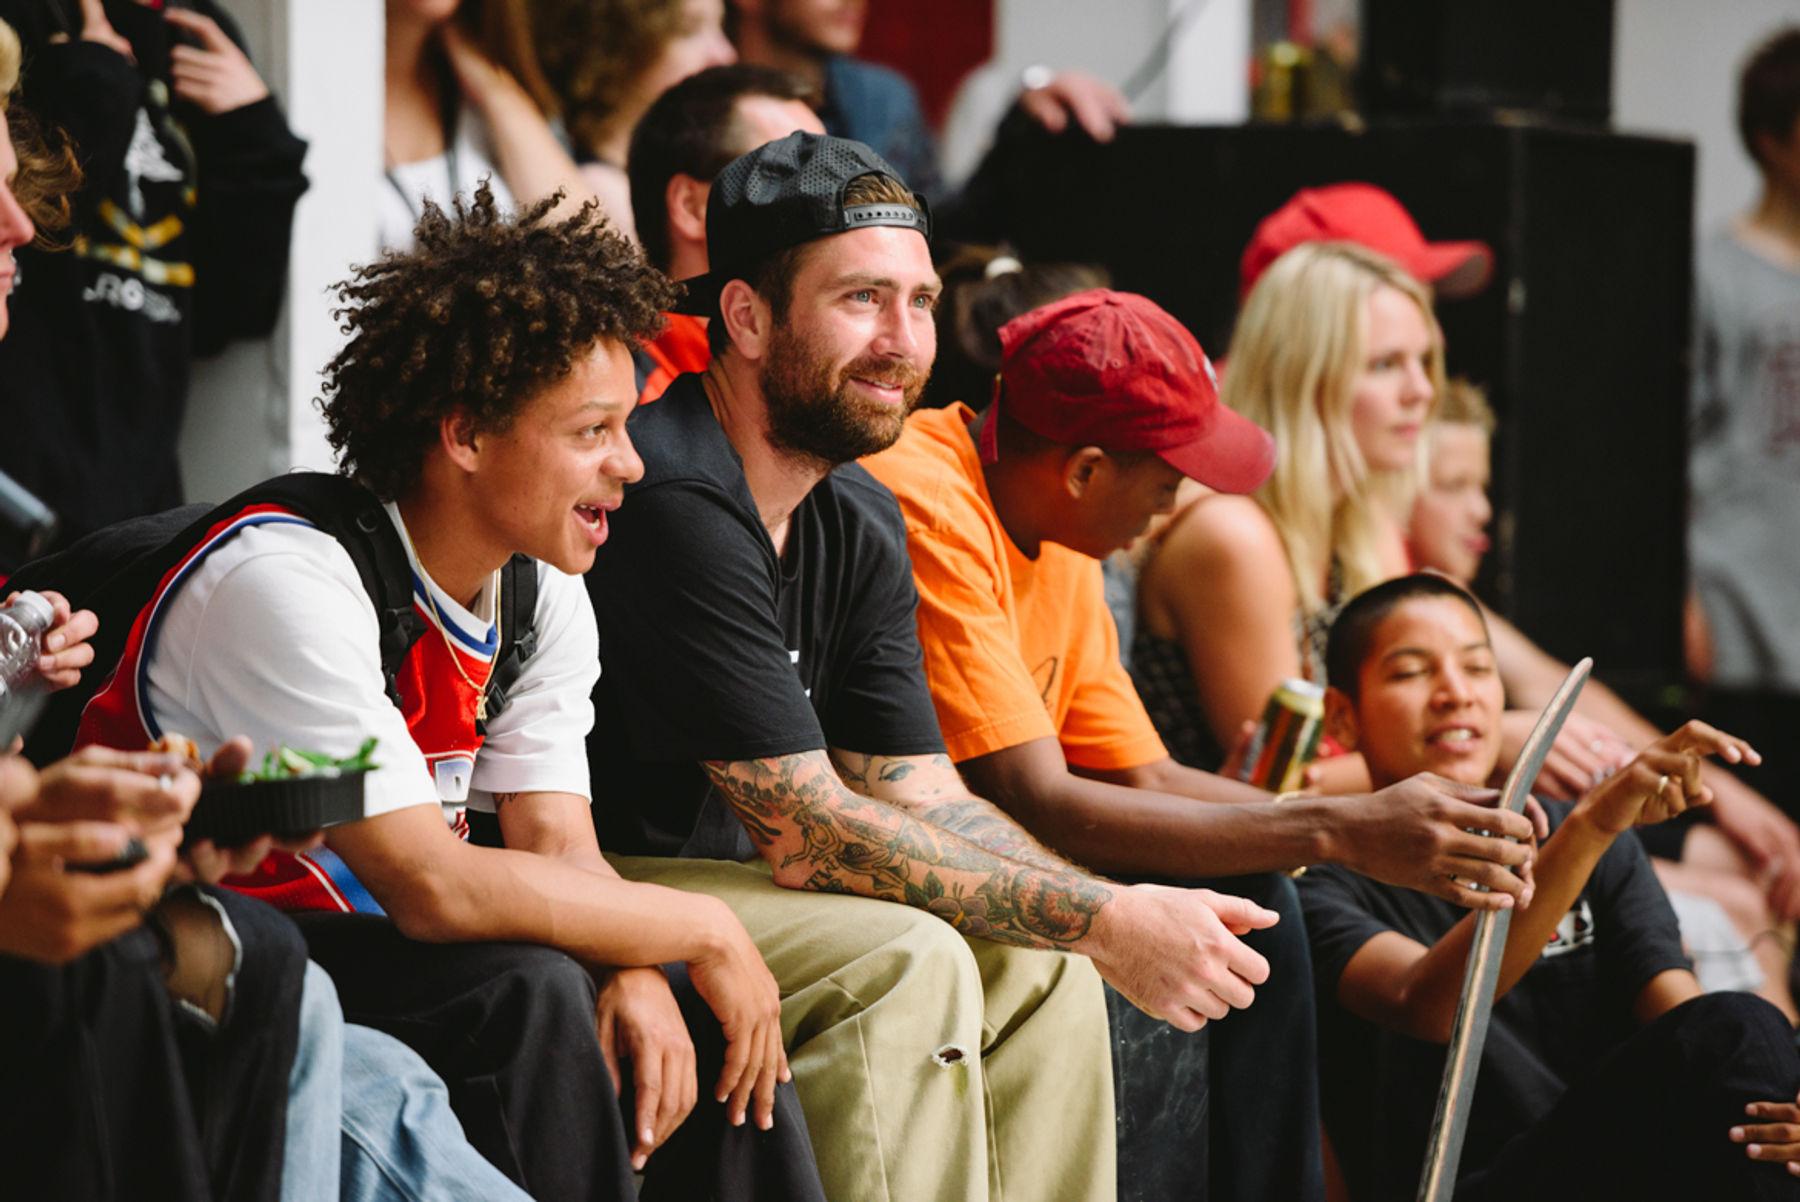 _IHC4691e-Kevin-Bradley-Bobby-Worrest-Nike-SB-Copenhagen-Open-Day-3-July-2015-Photographer-Maksim-Kalanep